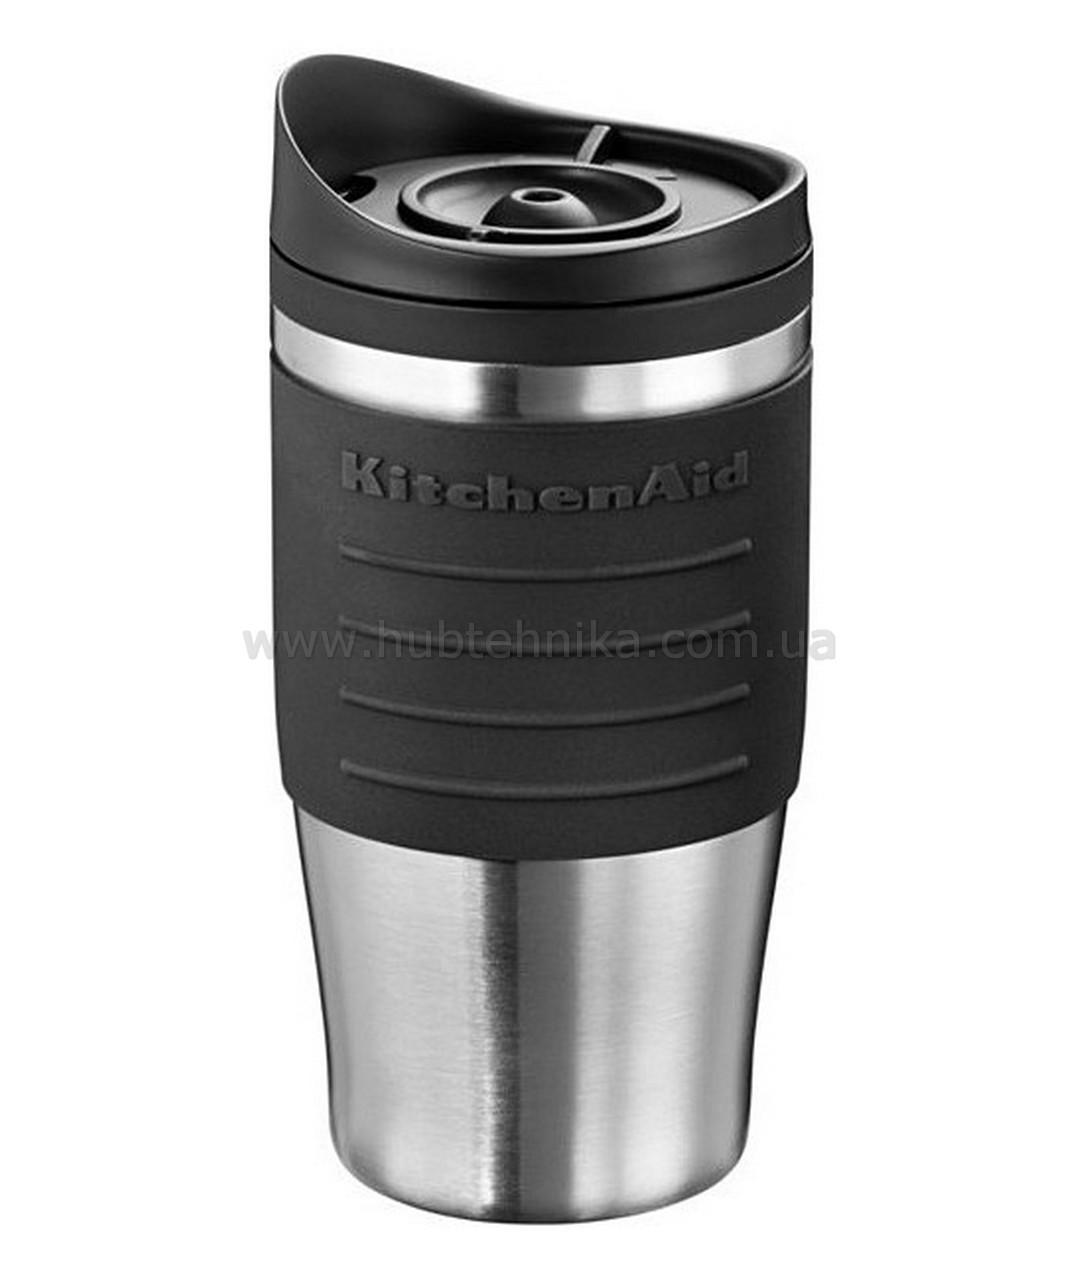 Термокружка KitchenAid 5ЛСМ0402